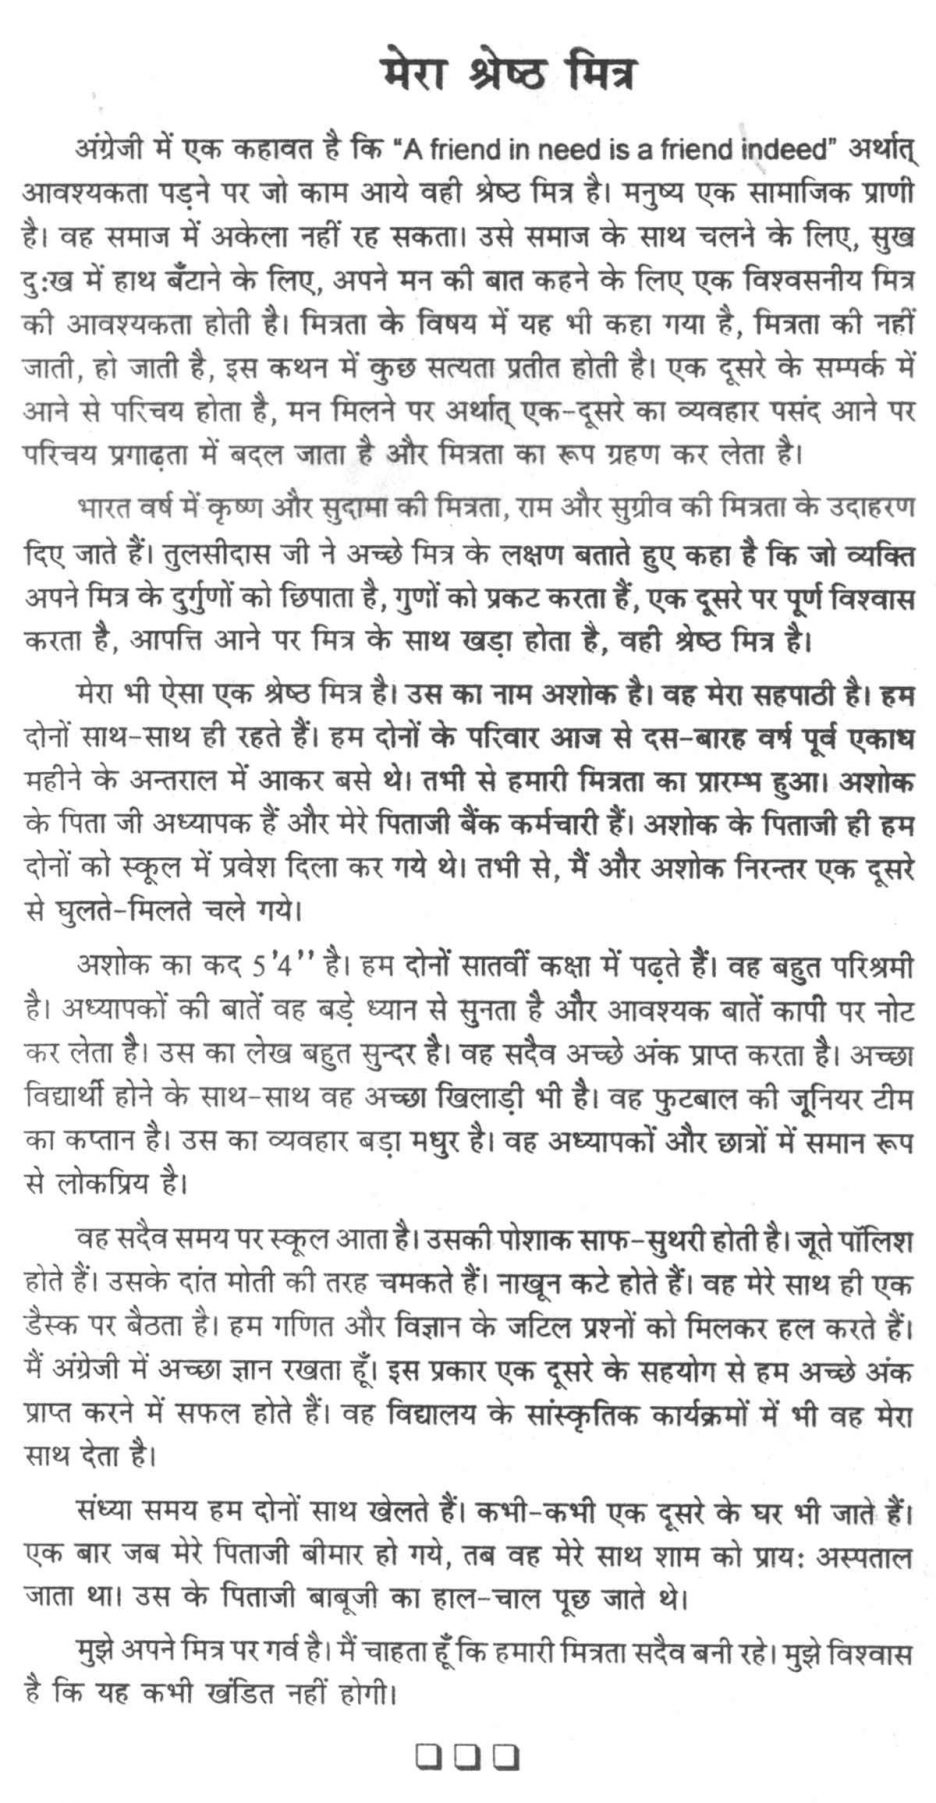 003 Essay Example Qualities Of Good Friends Friend Thumb Teacher Great Characteristics Pdf In Hindi Three Free Language Urdu Amazing A Conclusion Spm Full